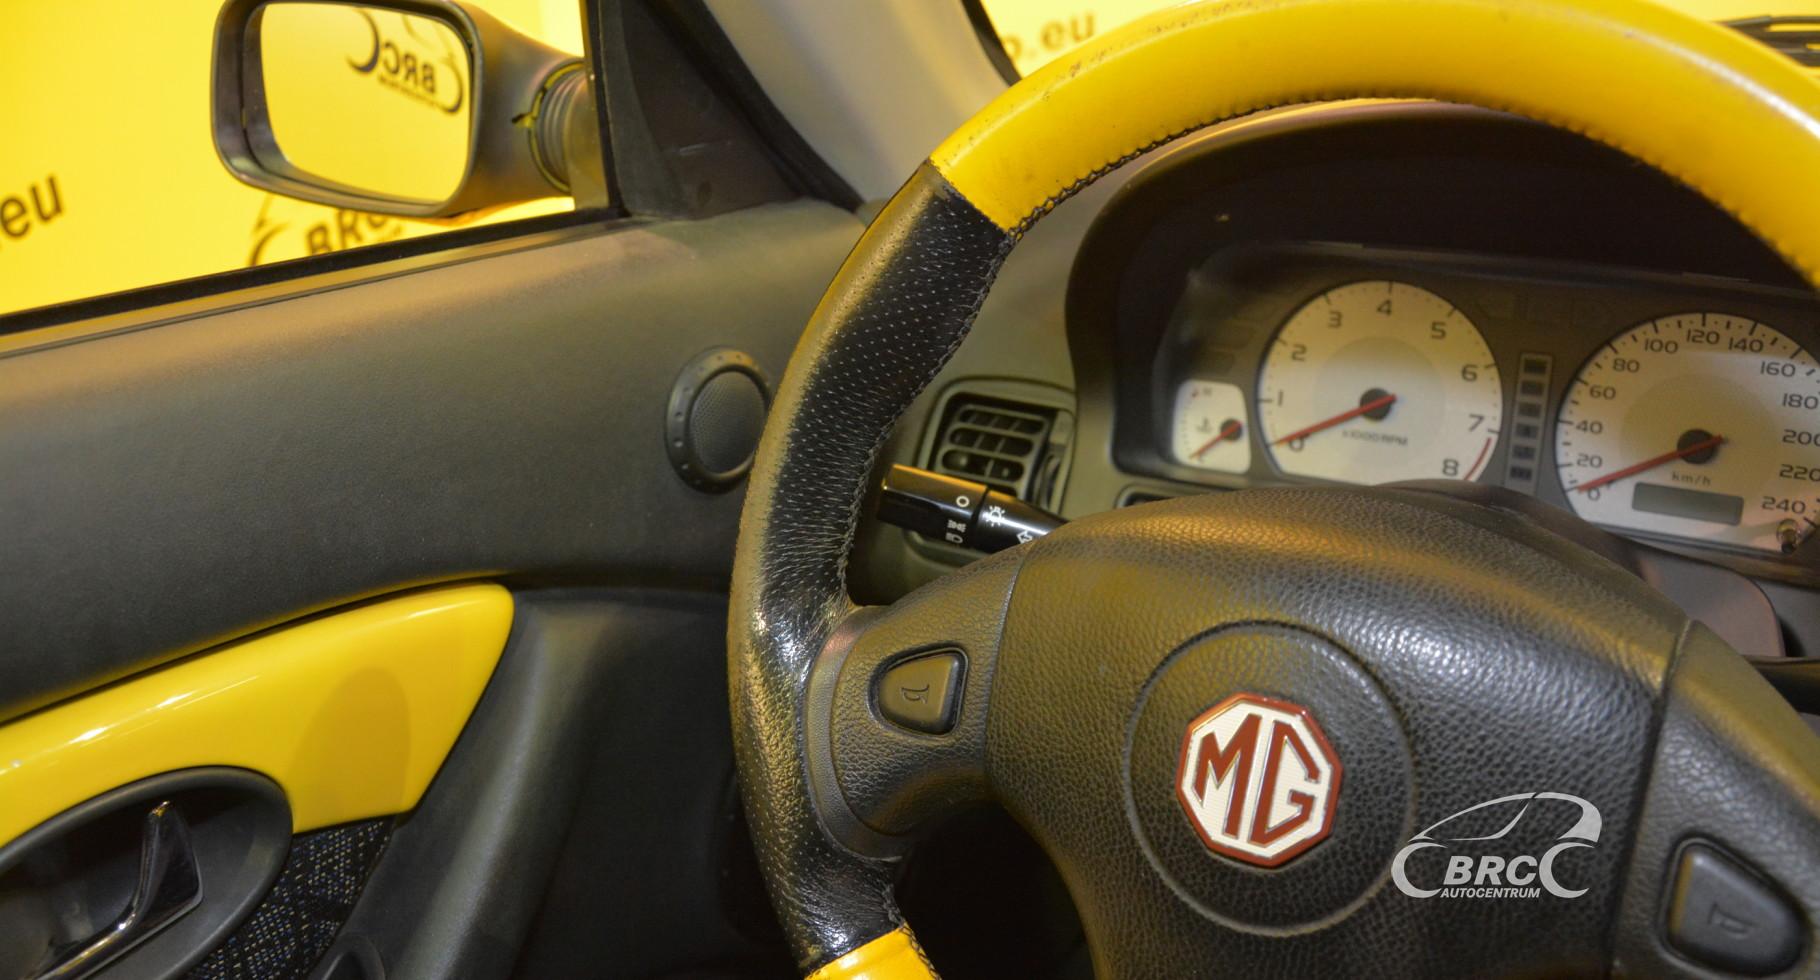 MG MGF Trophy 160